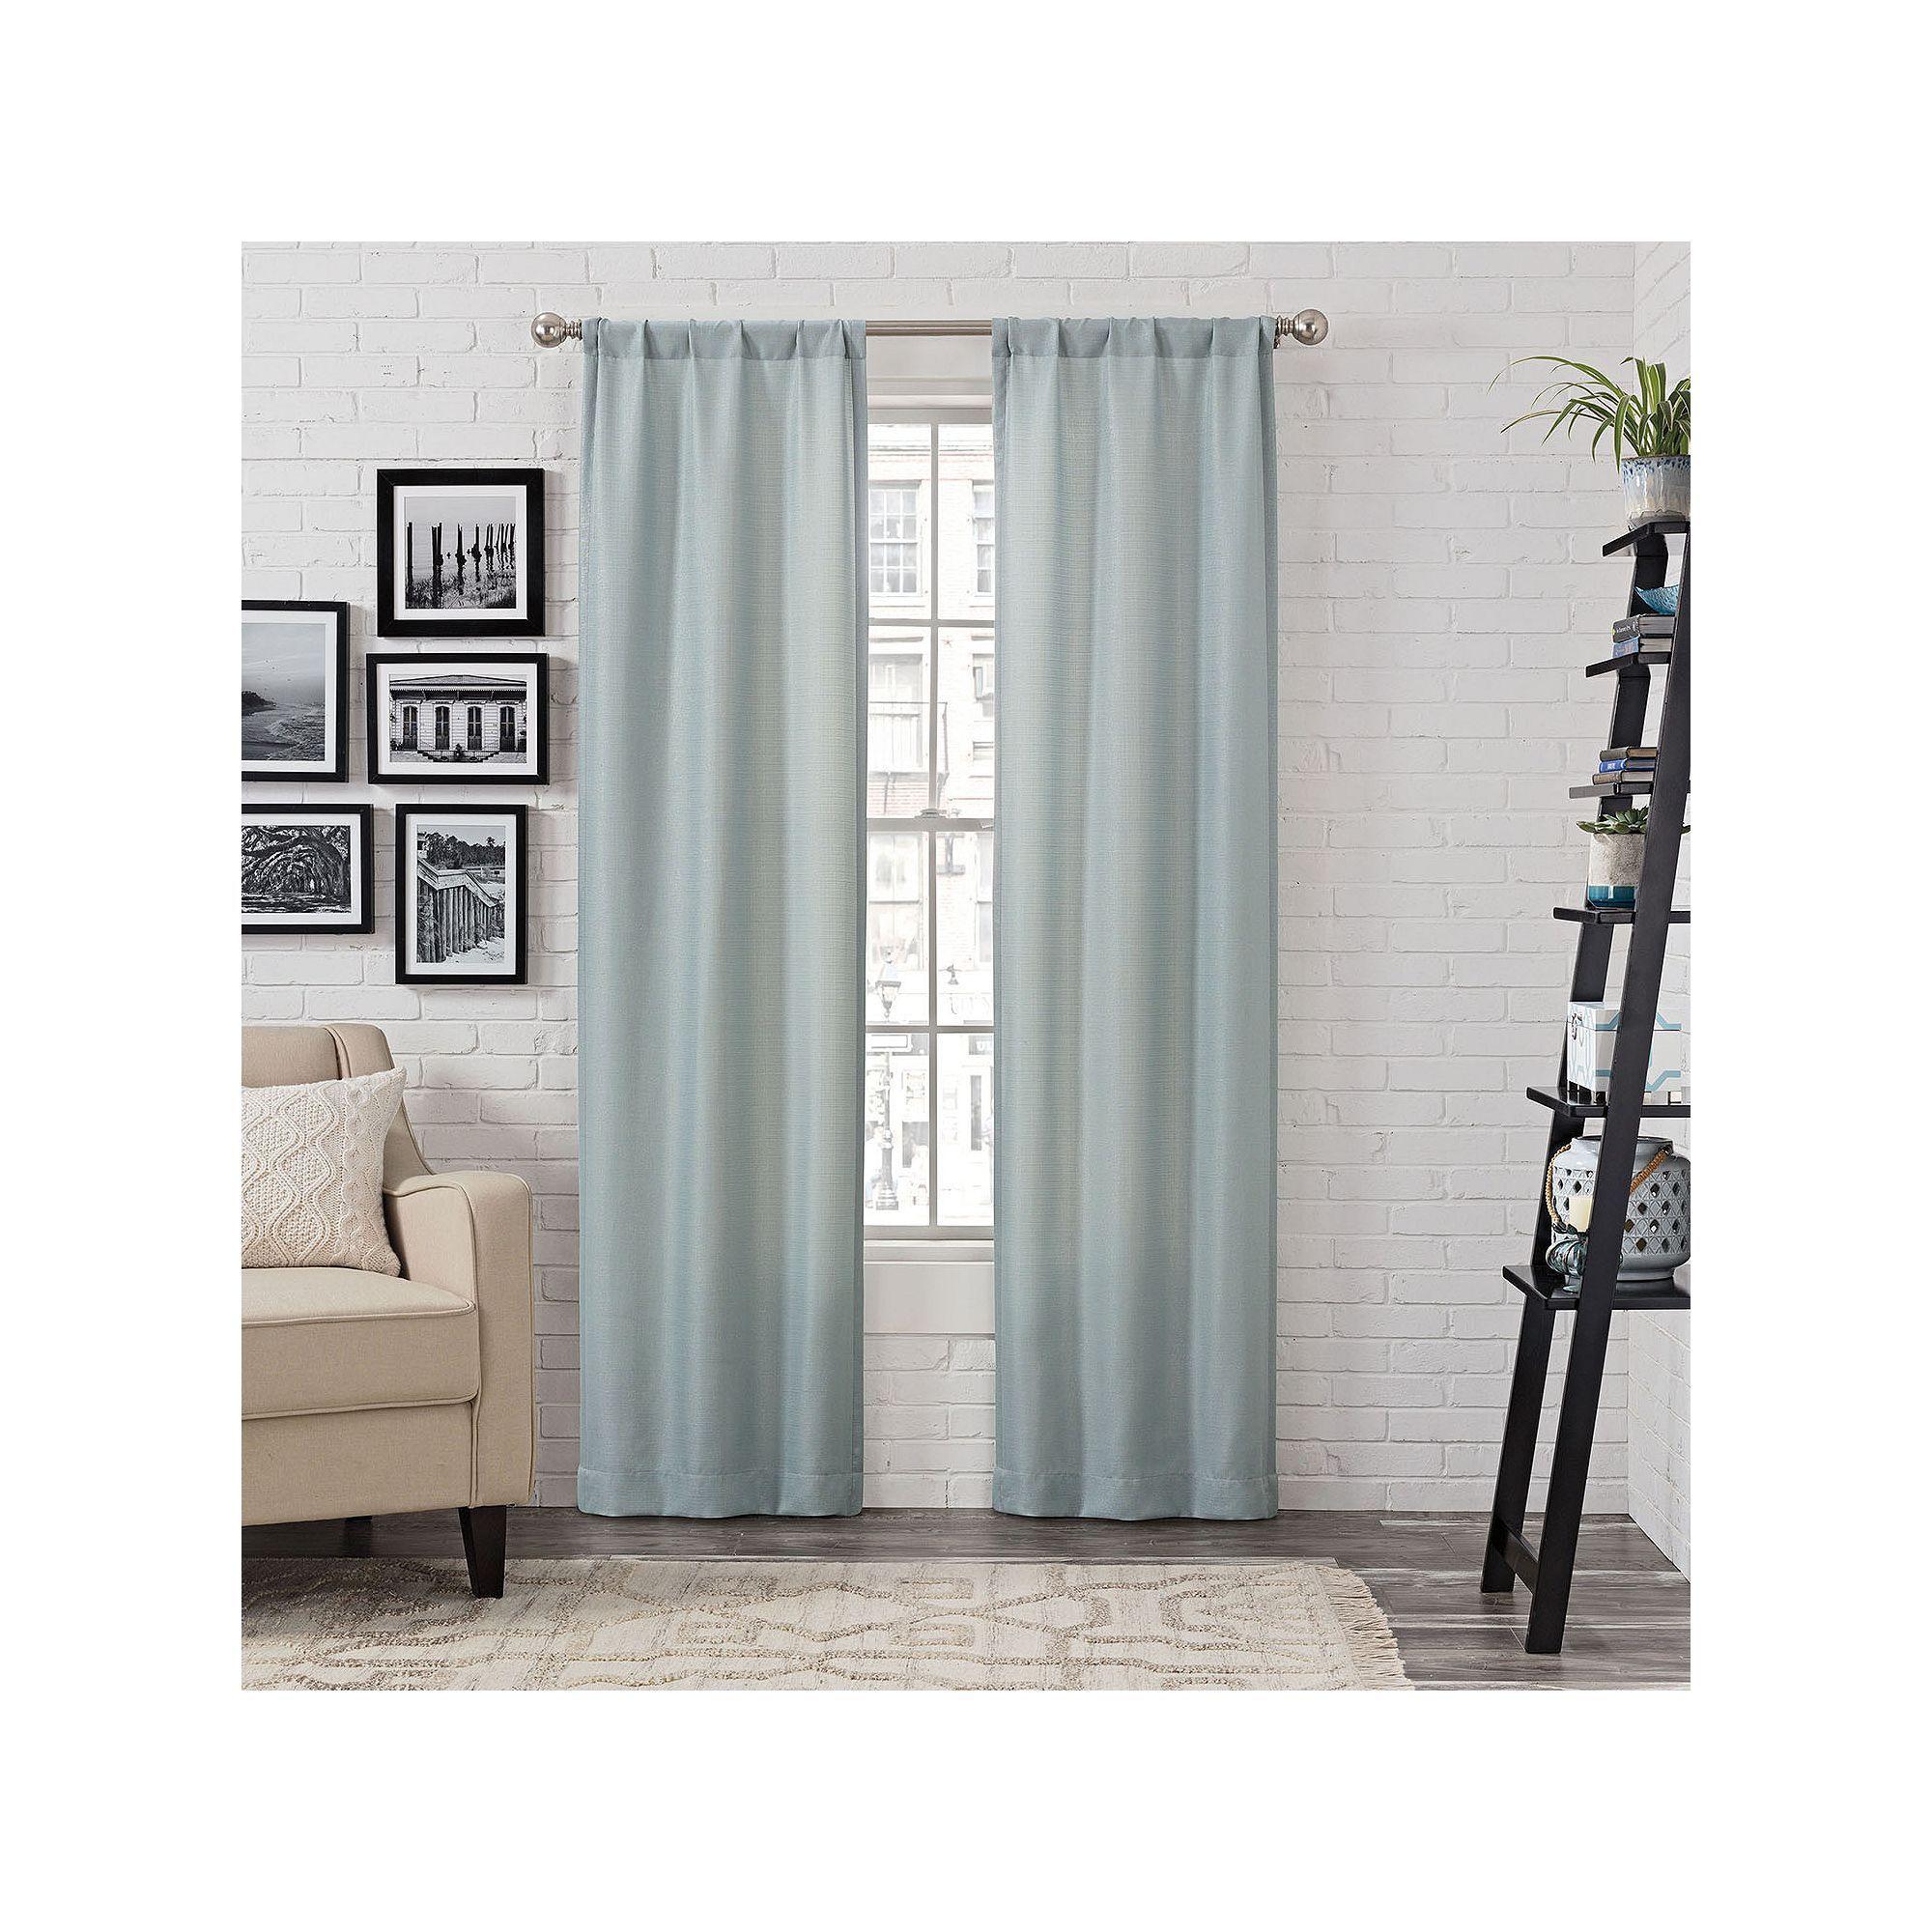 Garden window coverings  pairs to go ibiza metallic window curtain set  products